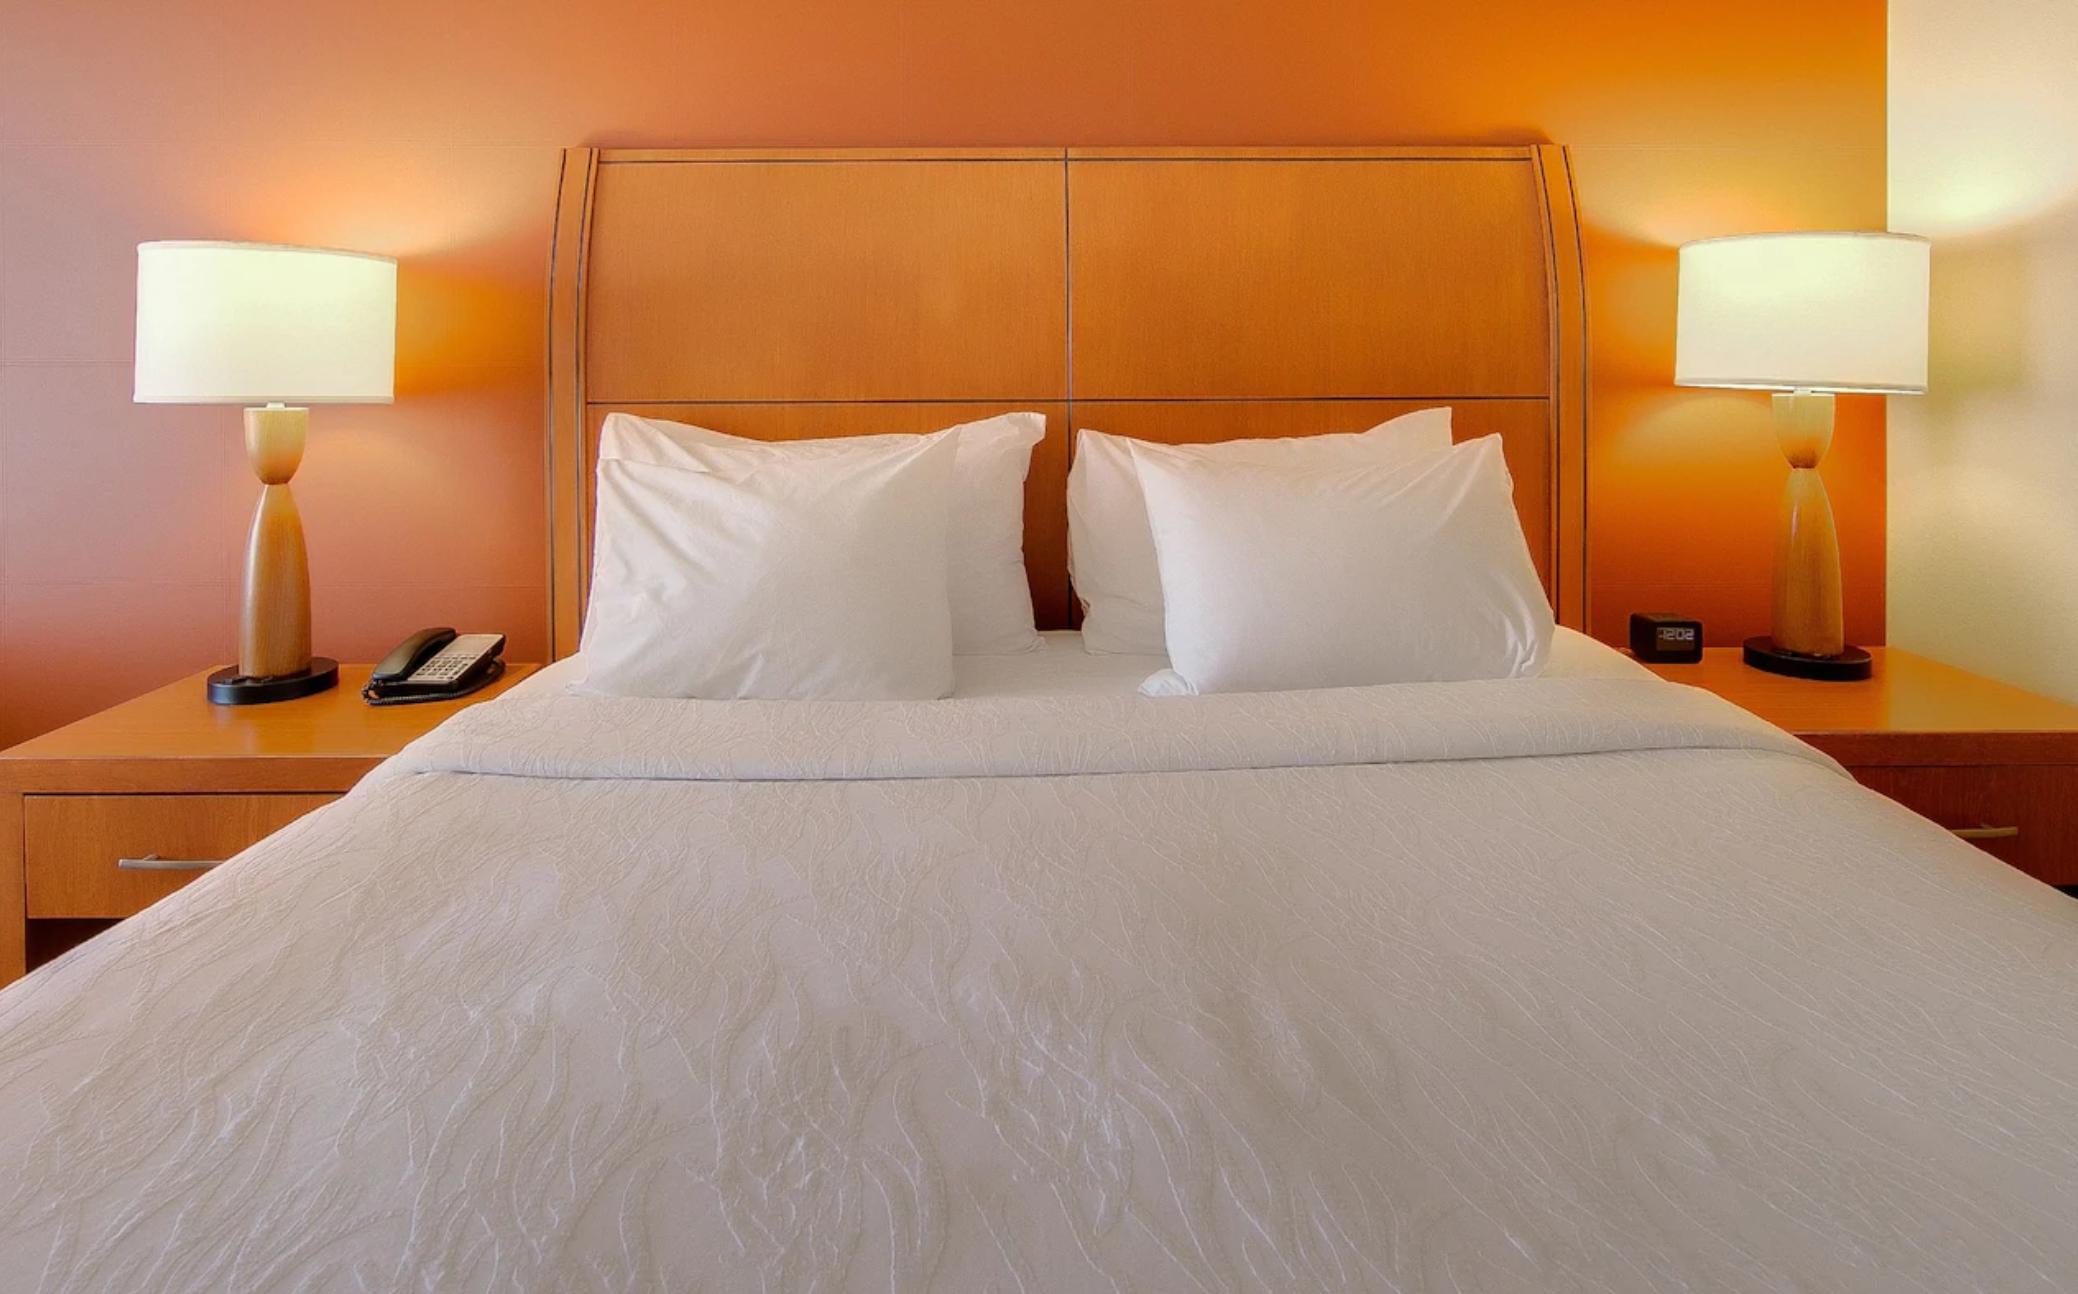 https://www.hotelsbyday.com/_data/default-hotel_image/4/23326/screenshot-2020-10-30-at-5-01-54-pm.png